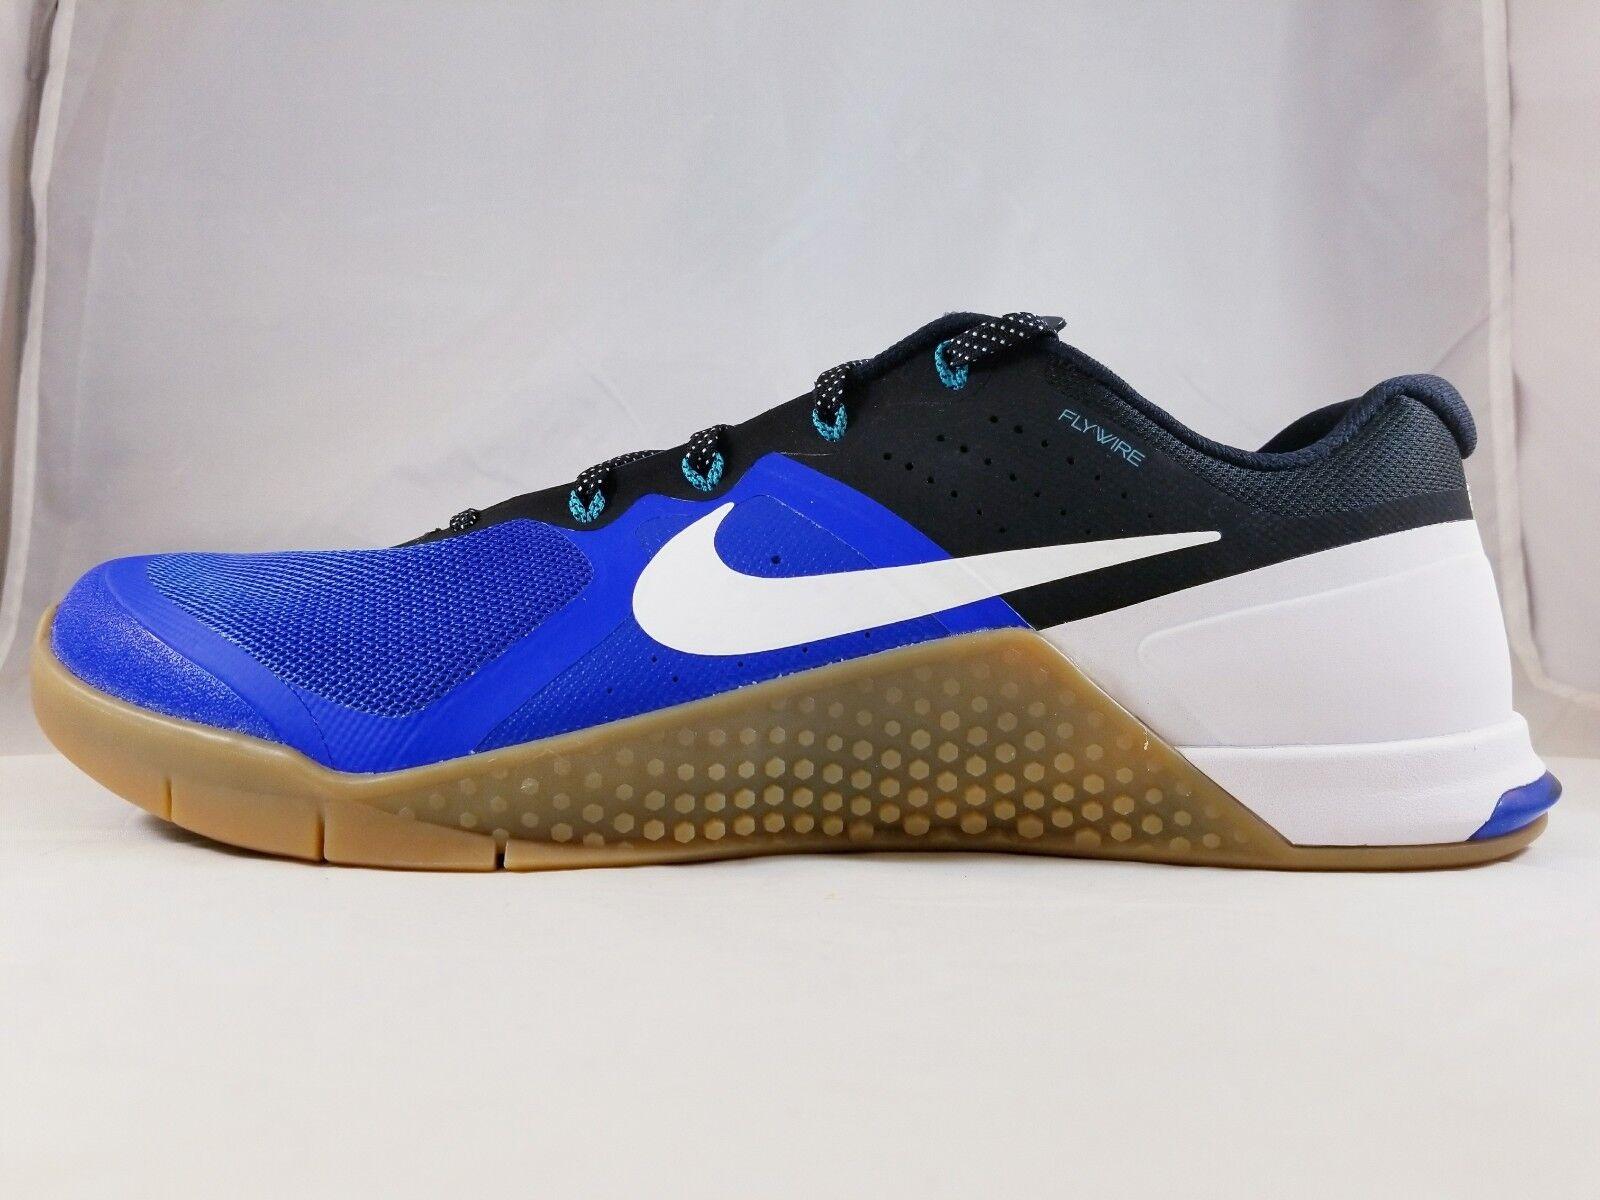 Nike metcon metcon metcon 2 uomini cross, scarpa 819899 480 numero 15 b9054f